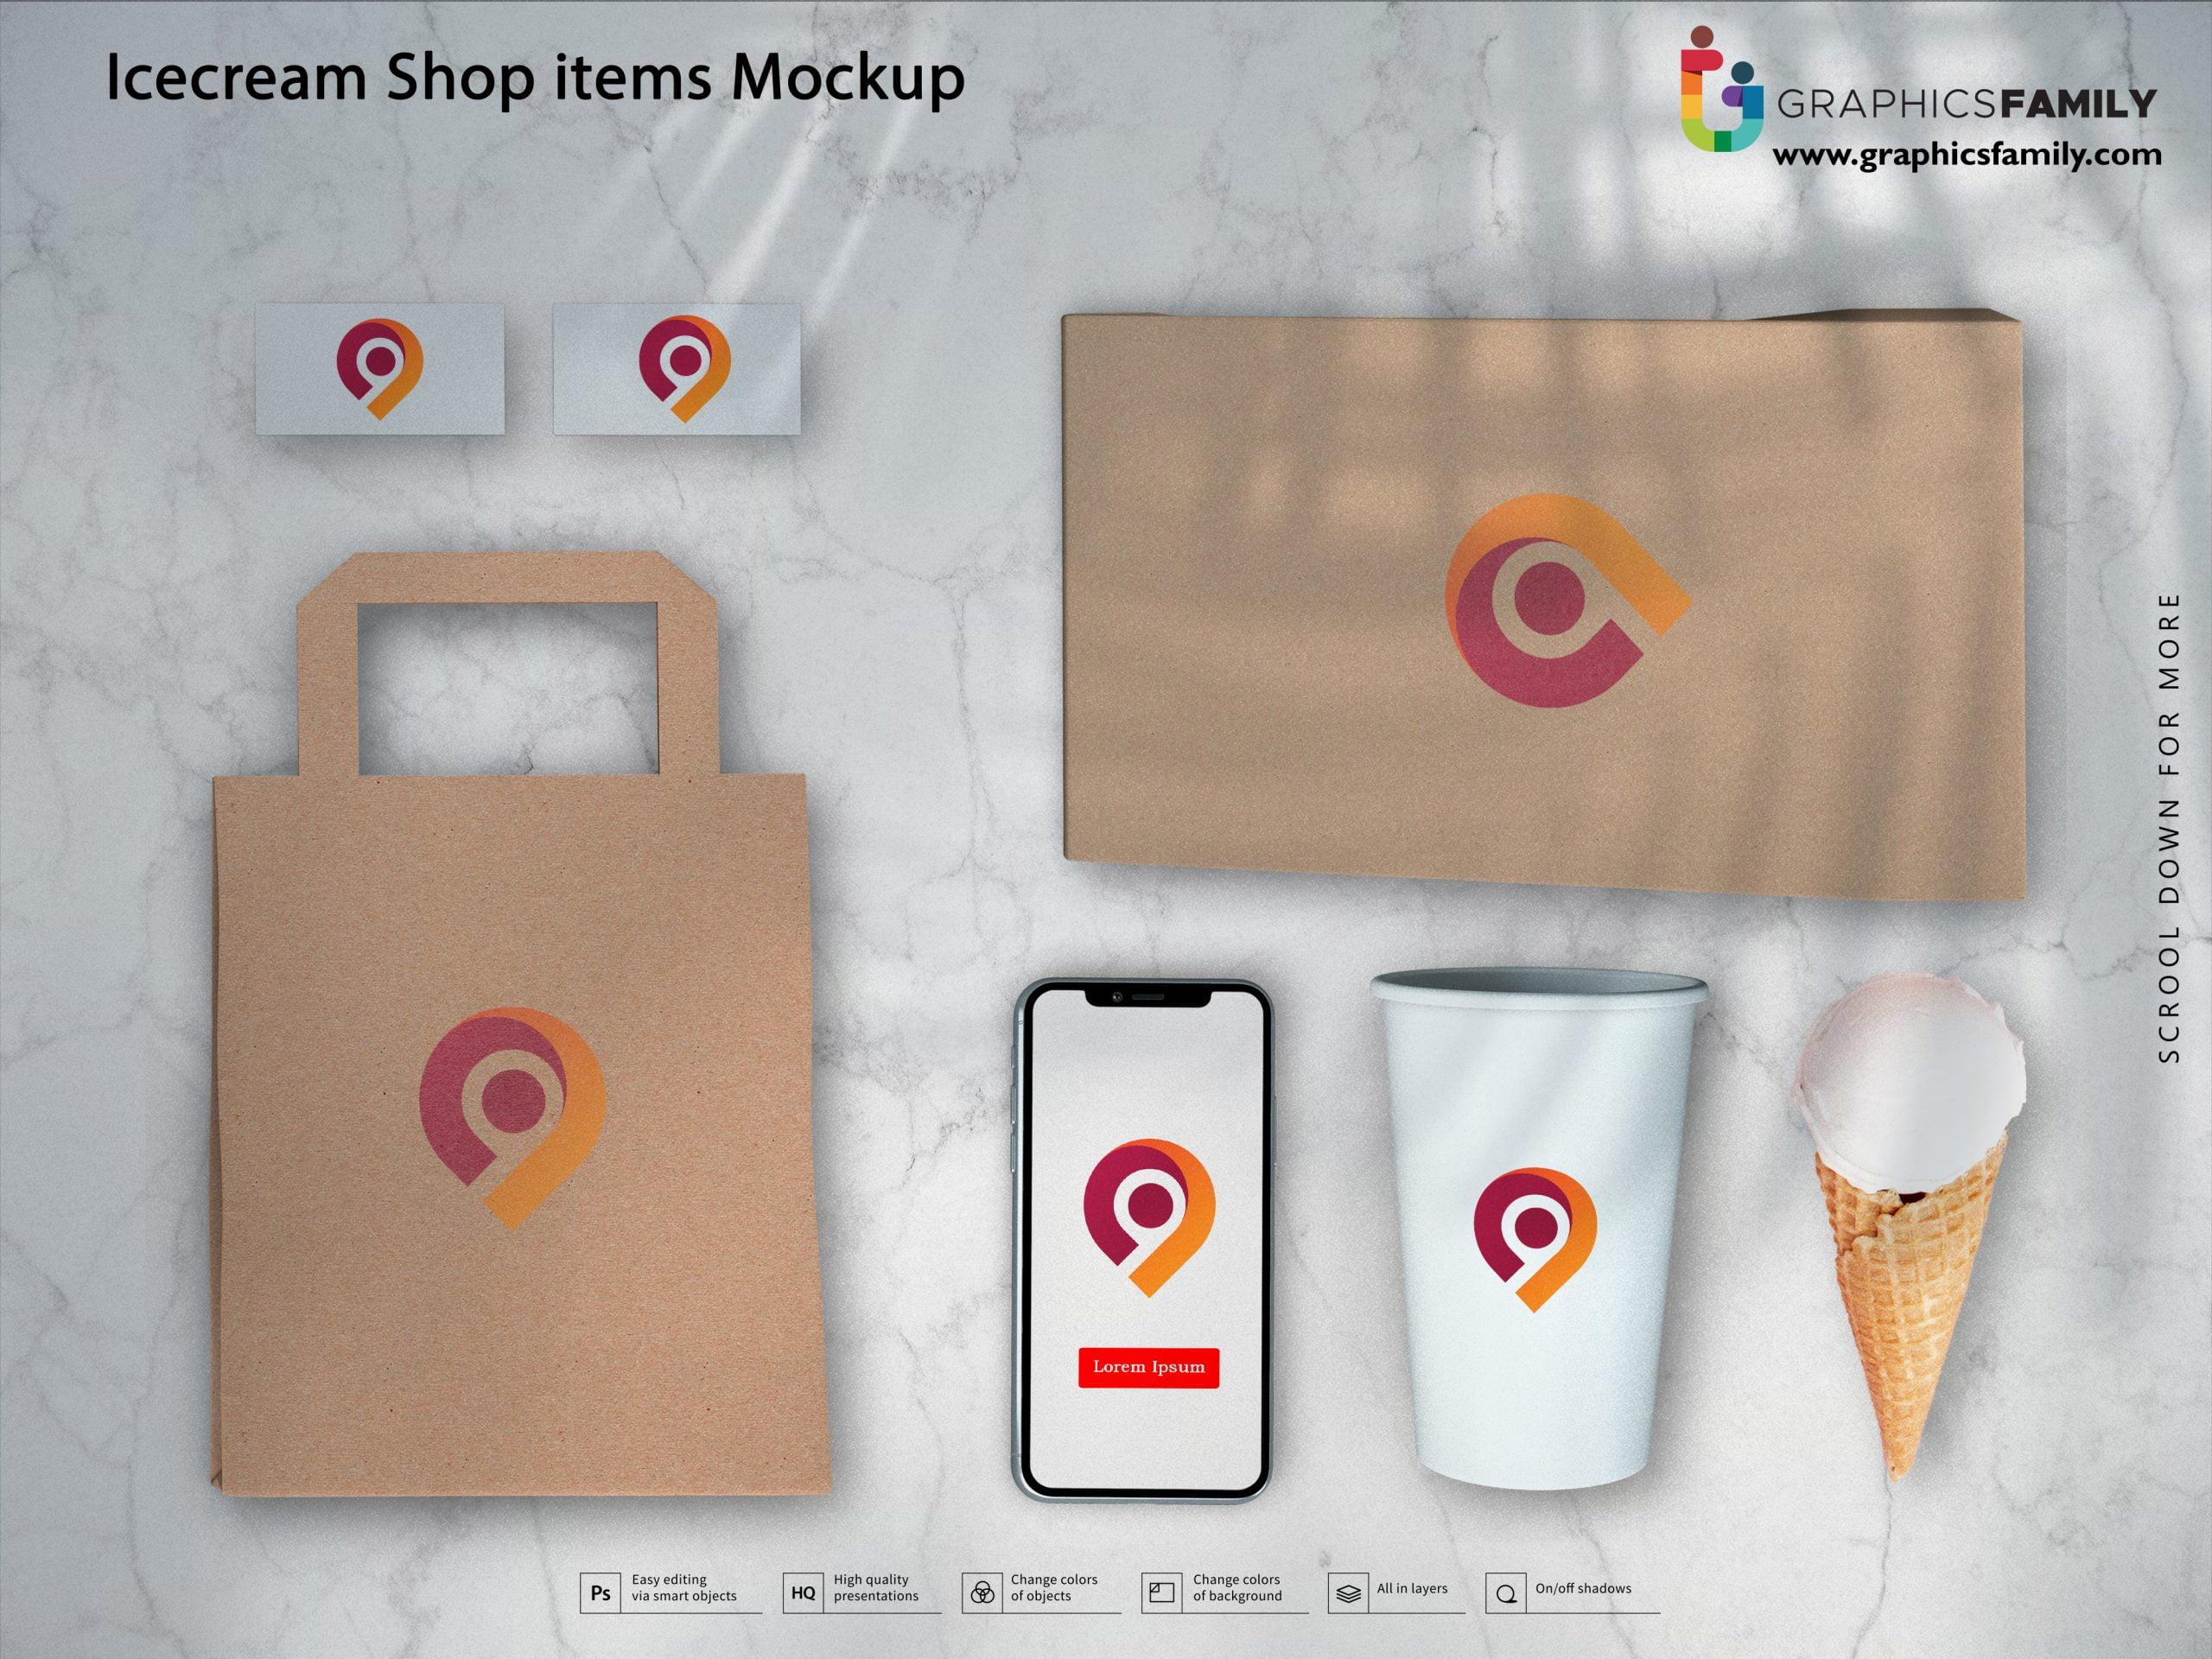 Icecream-Shop-Item-Mockup-Free-PSD